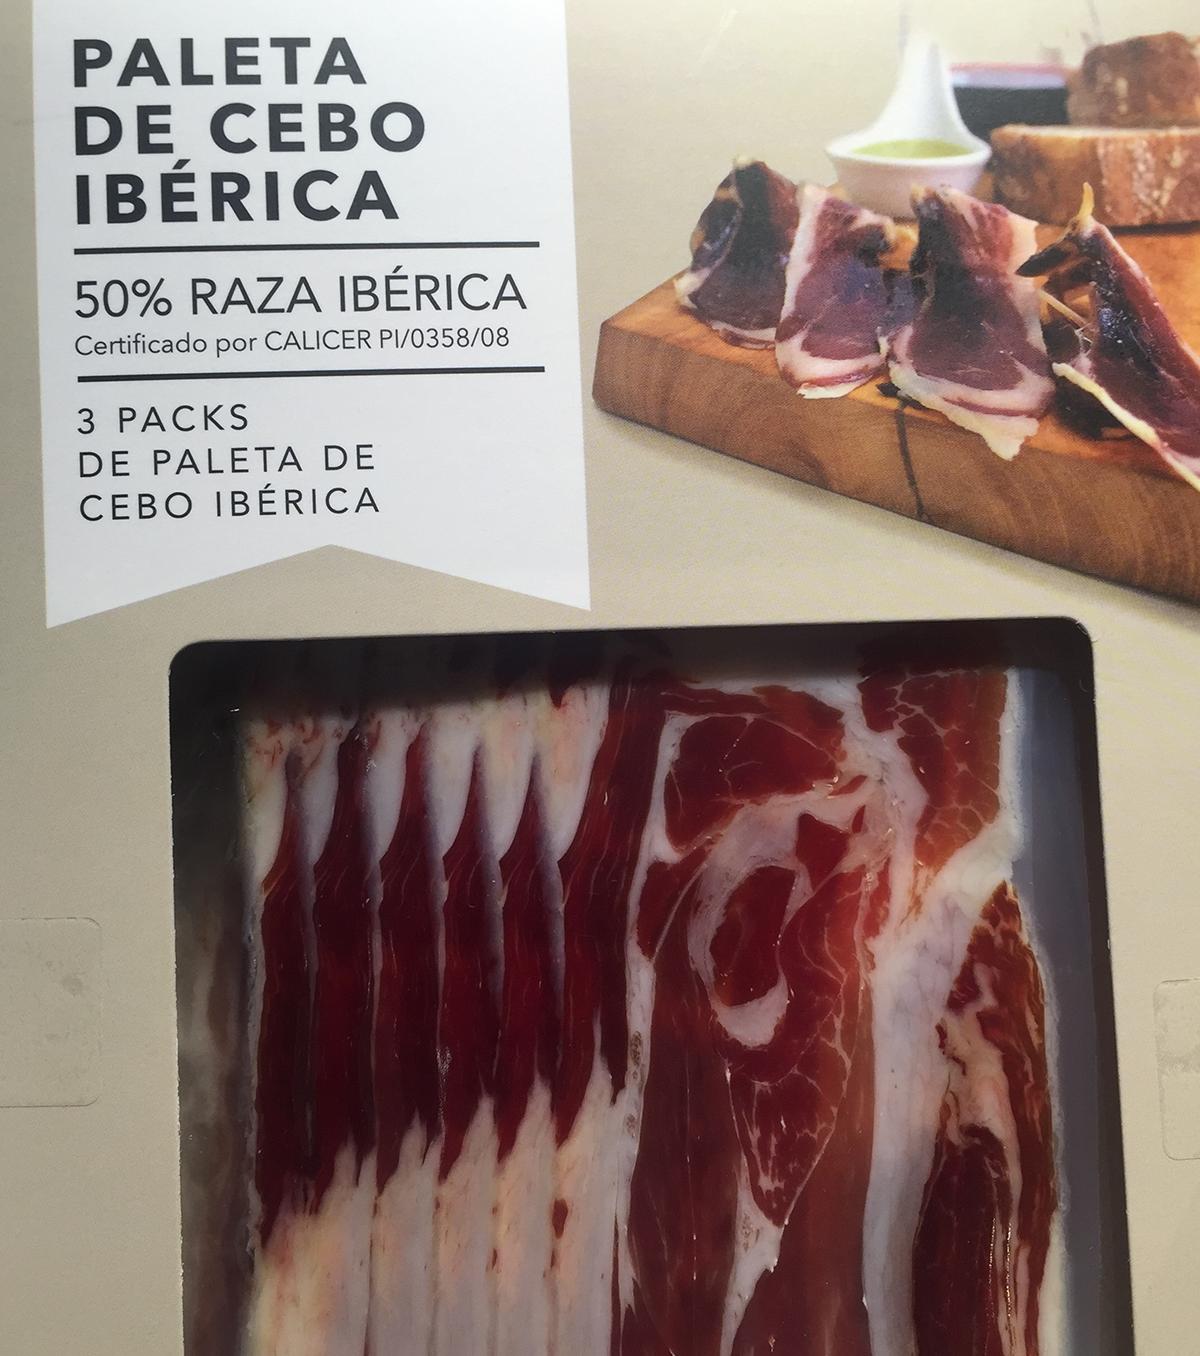 Paleta de Cebo Ibérica, pack loncheado